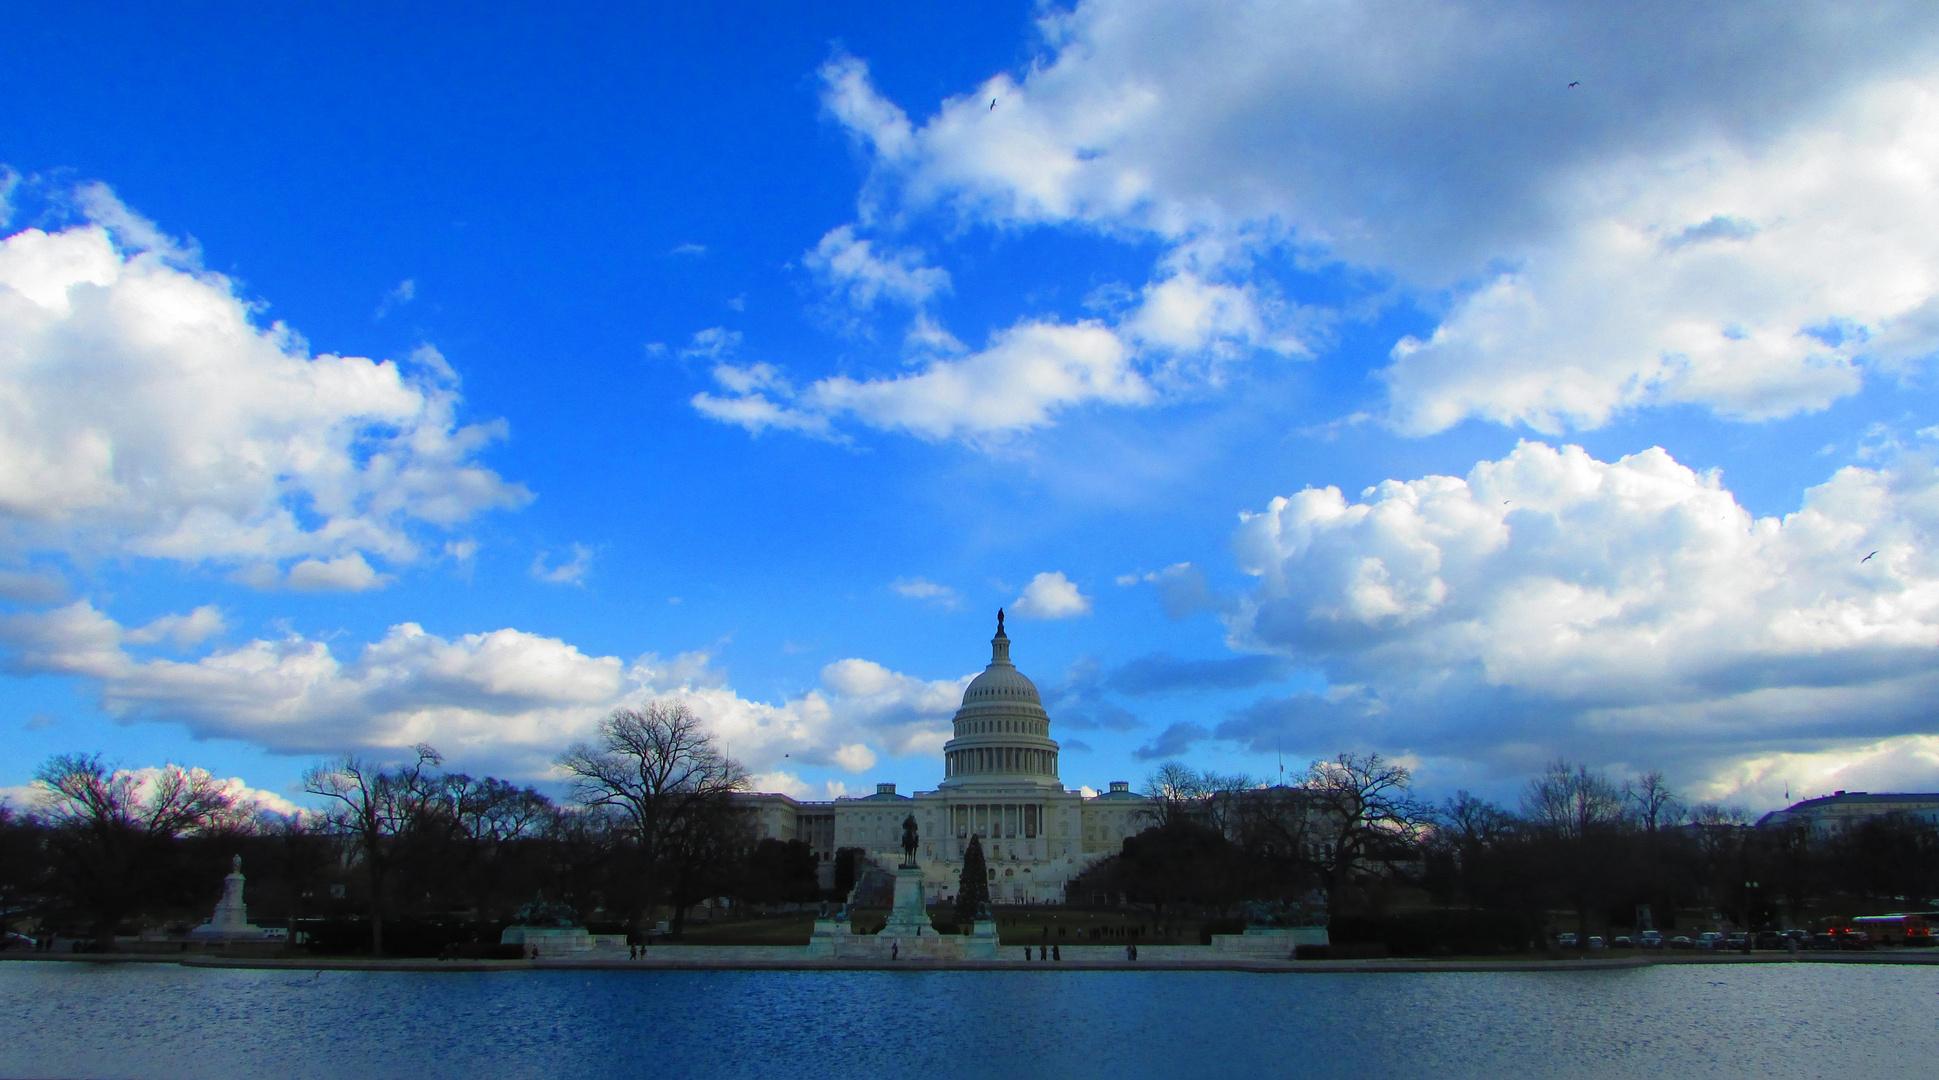 U.S. Capitol Washington, D.C.